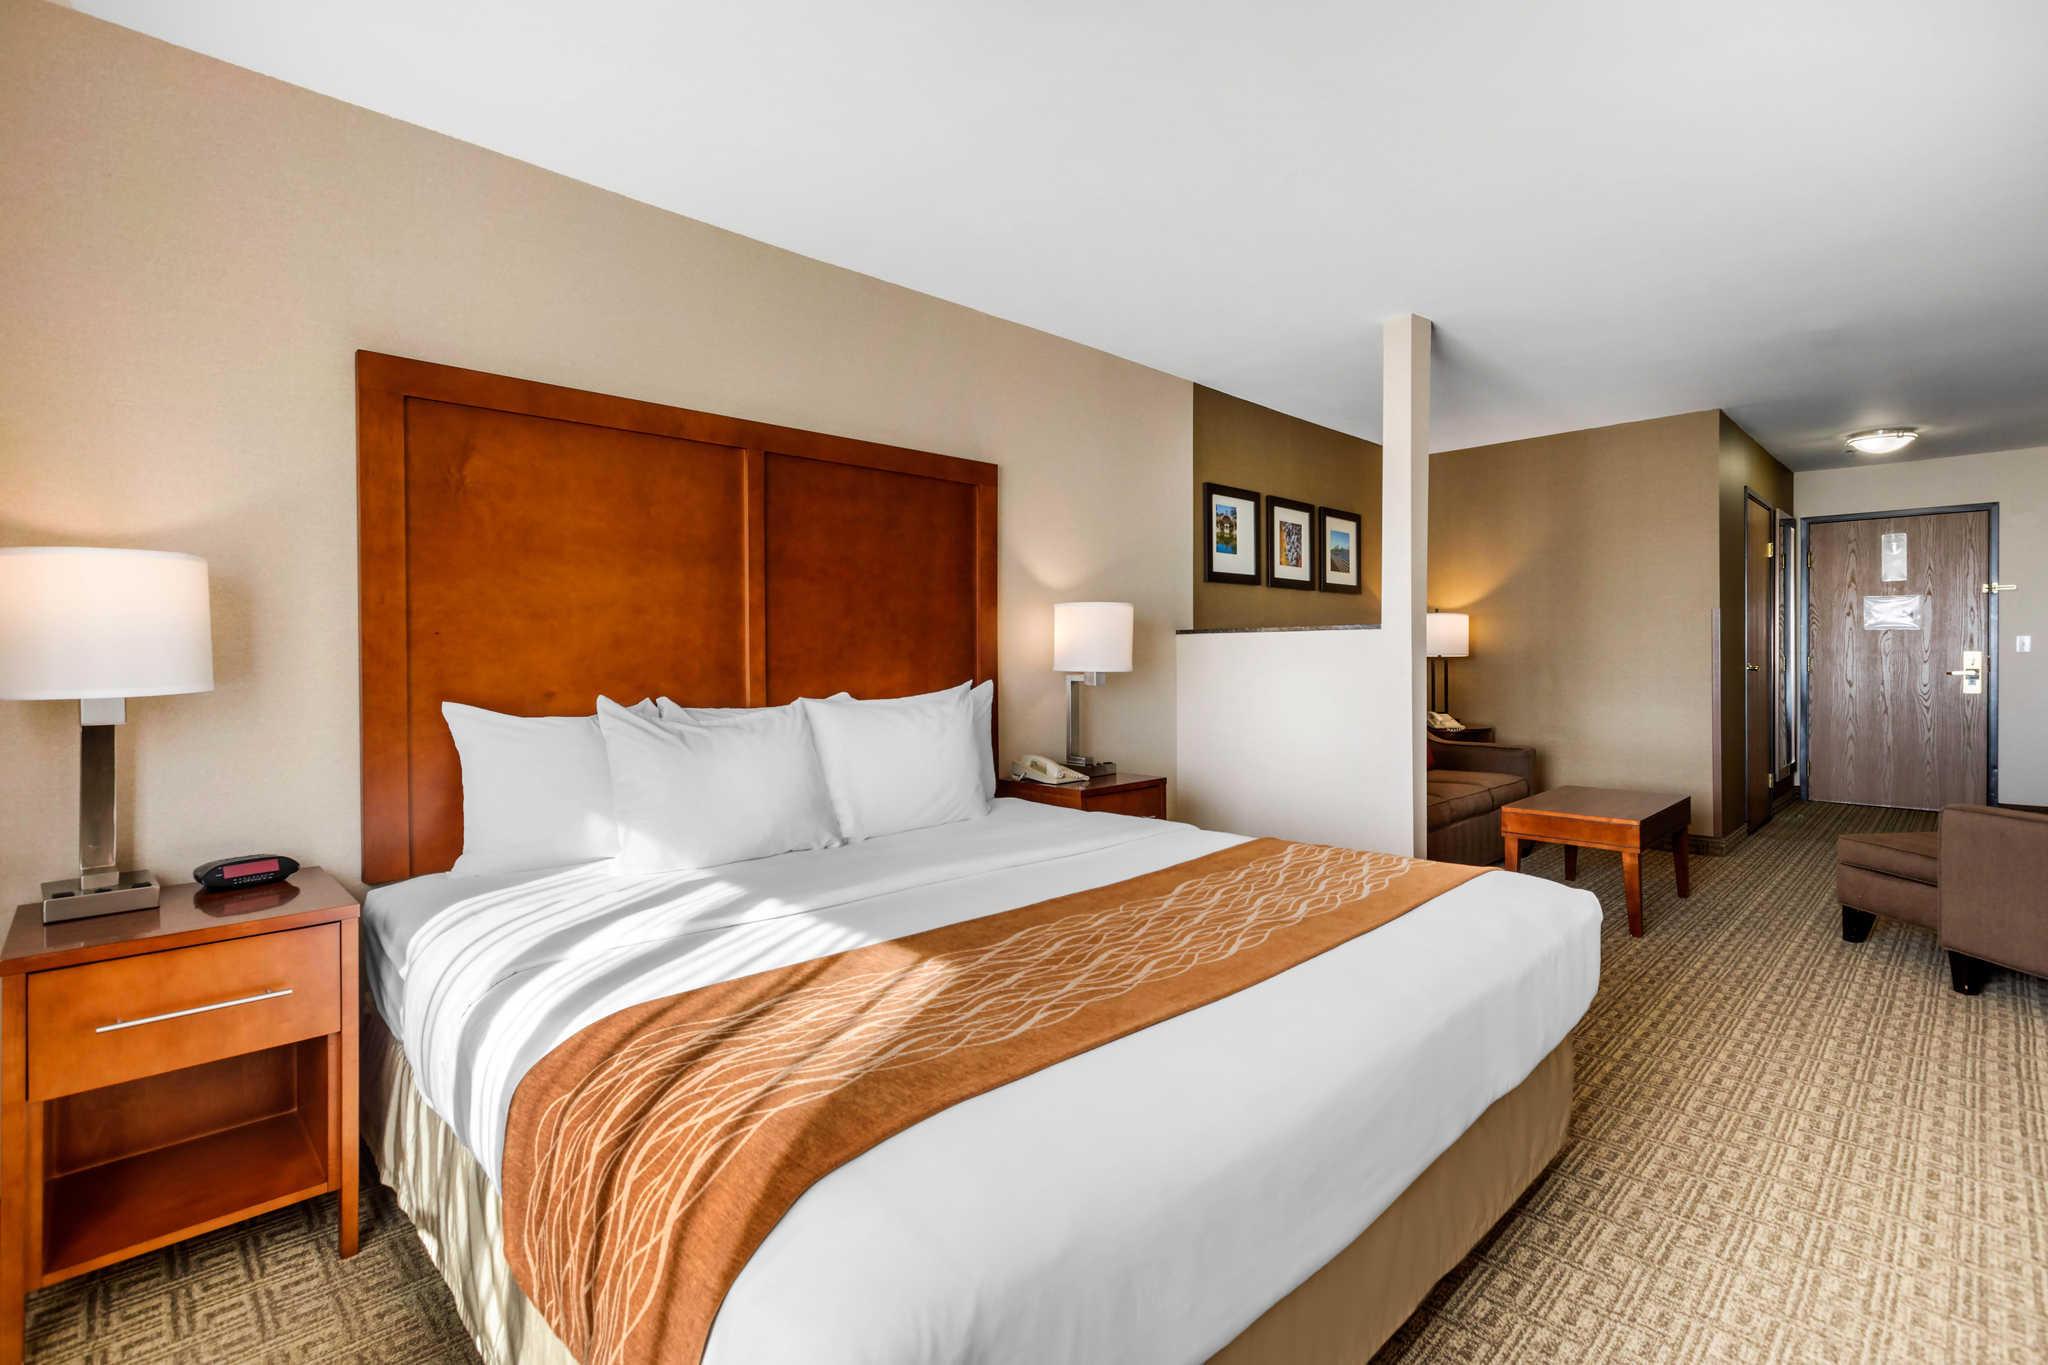 Comfort Inn & Suites Murrieta Temecula Wine Country image 20